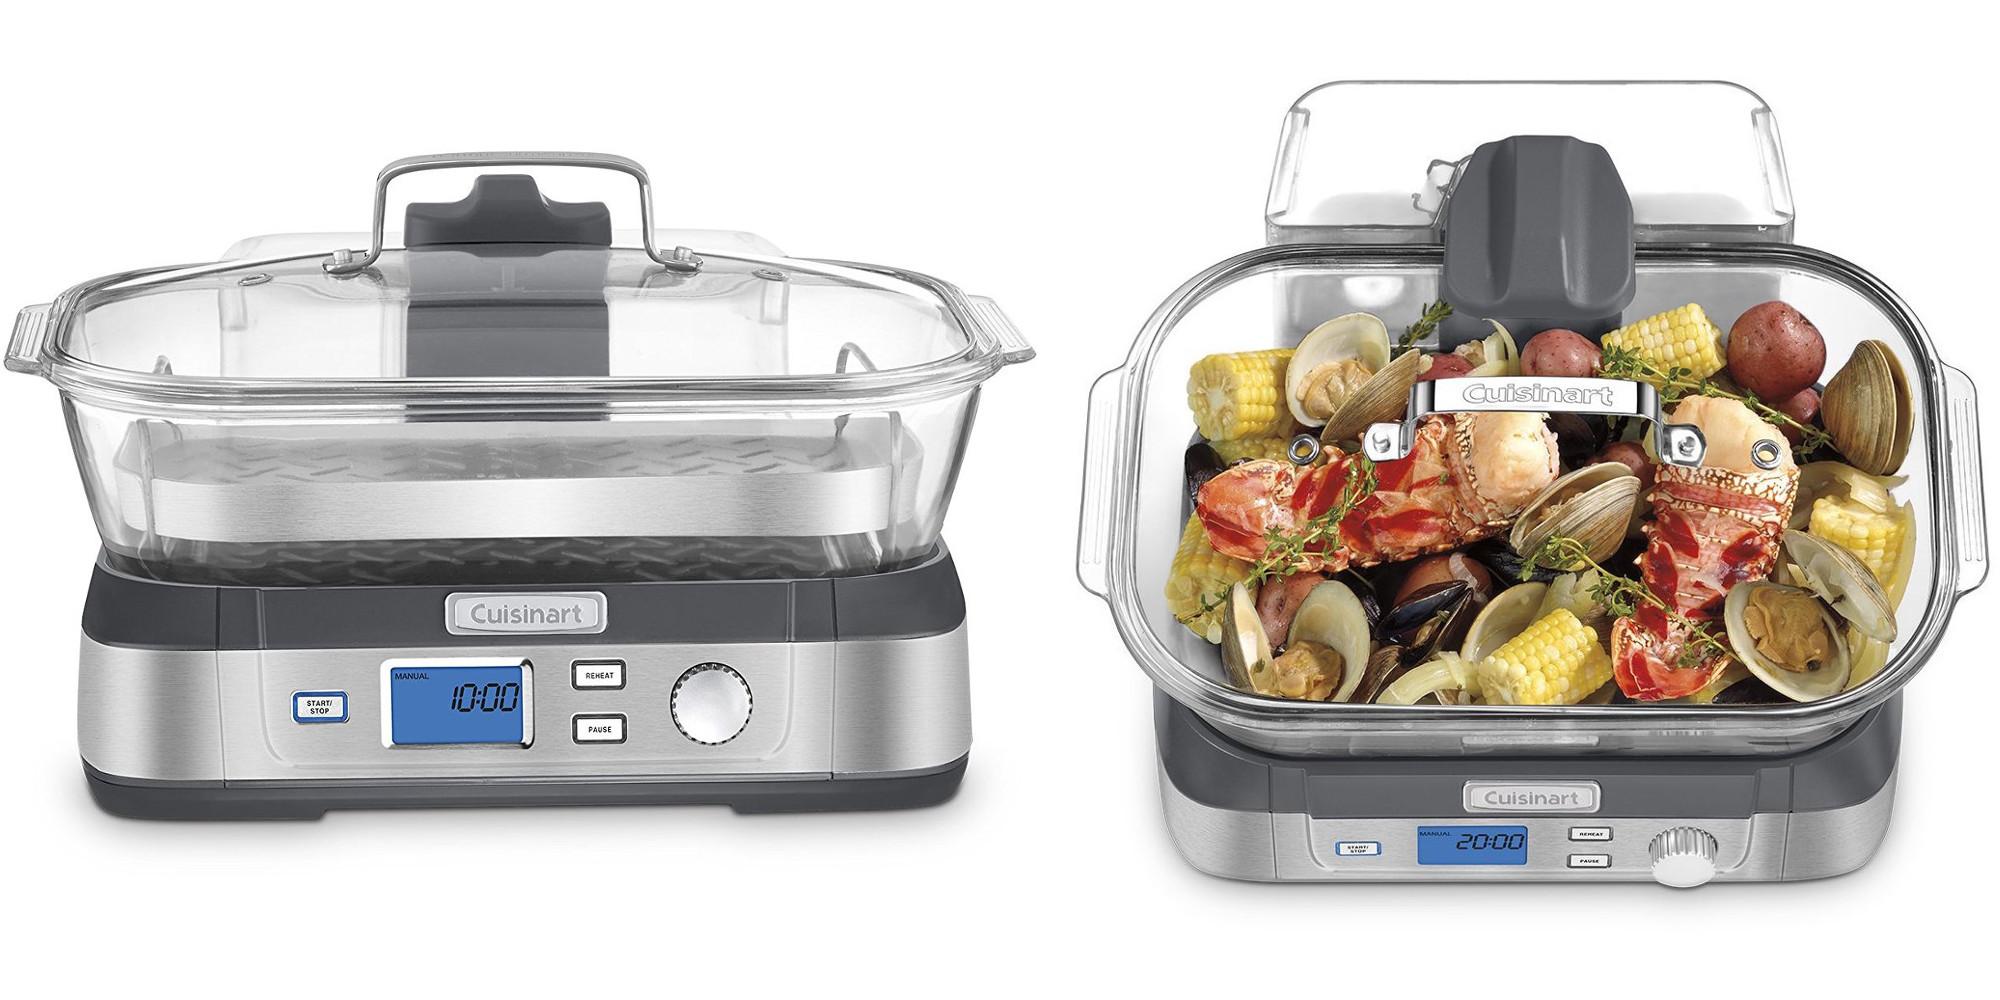 stainless-steel-cuisinart-cookfresh-digital-glass-steamer-3